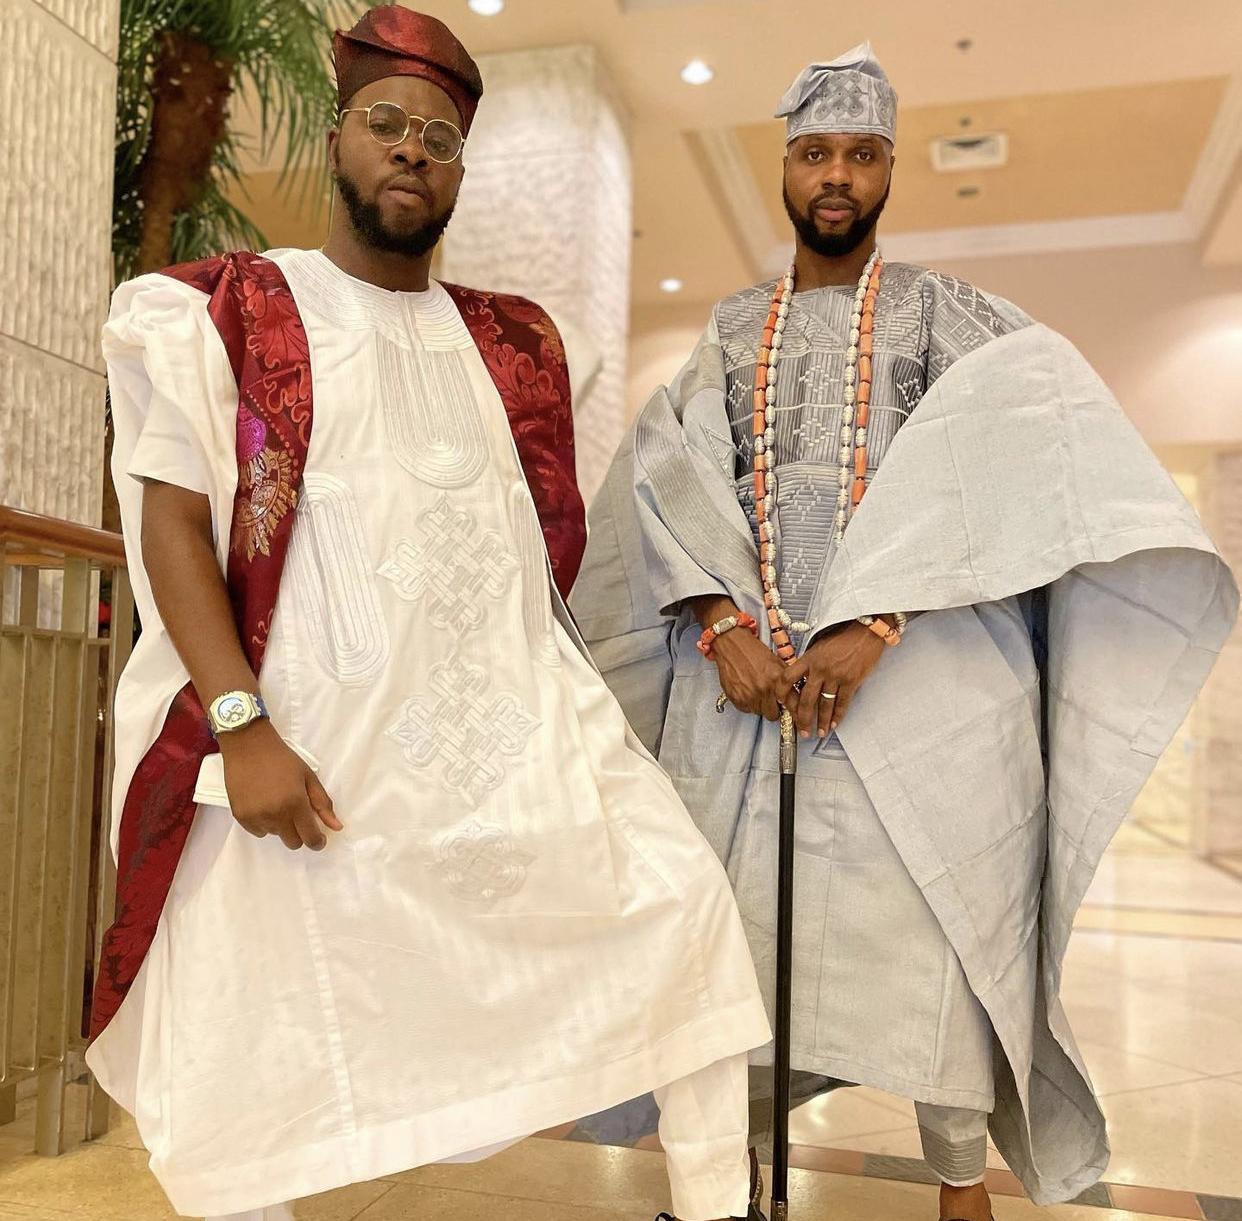 Prince Bukunyi Olateru-Olagbegi and the groom #KDLagos2021